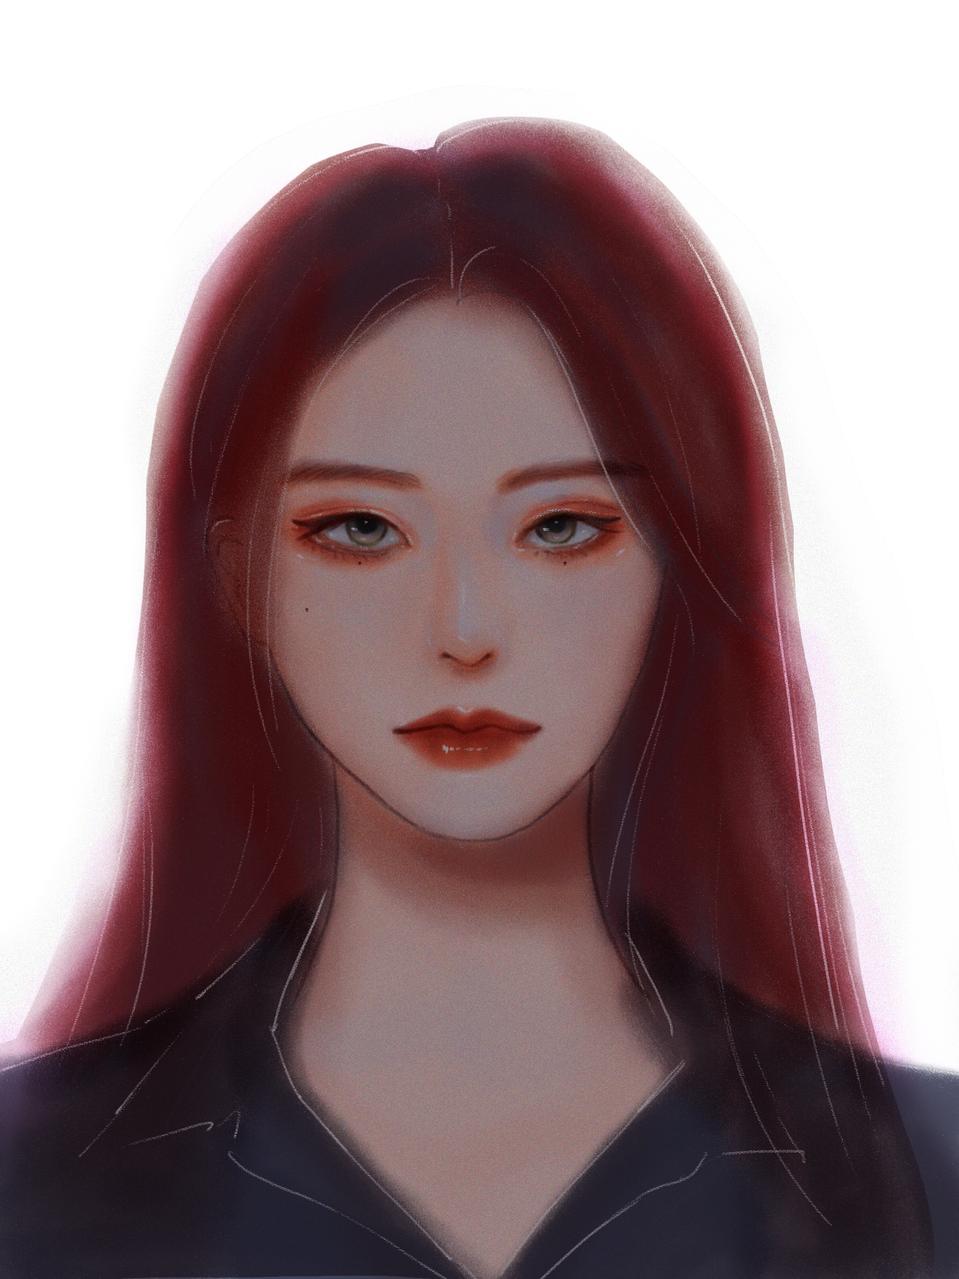 Red Hair Illust of Jiayi MyIdealWaifu August2020_Contest:Horror MyIdealWaifu_MyIdealHusbandoContest angry